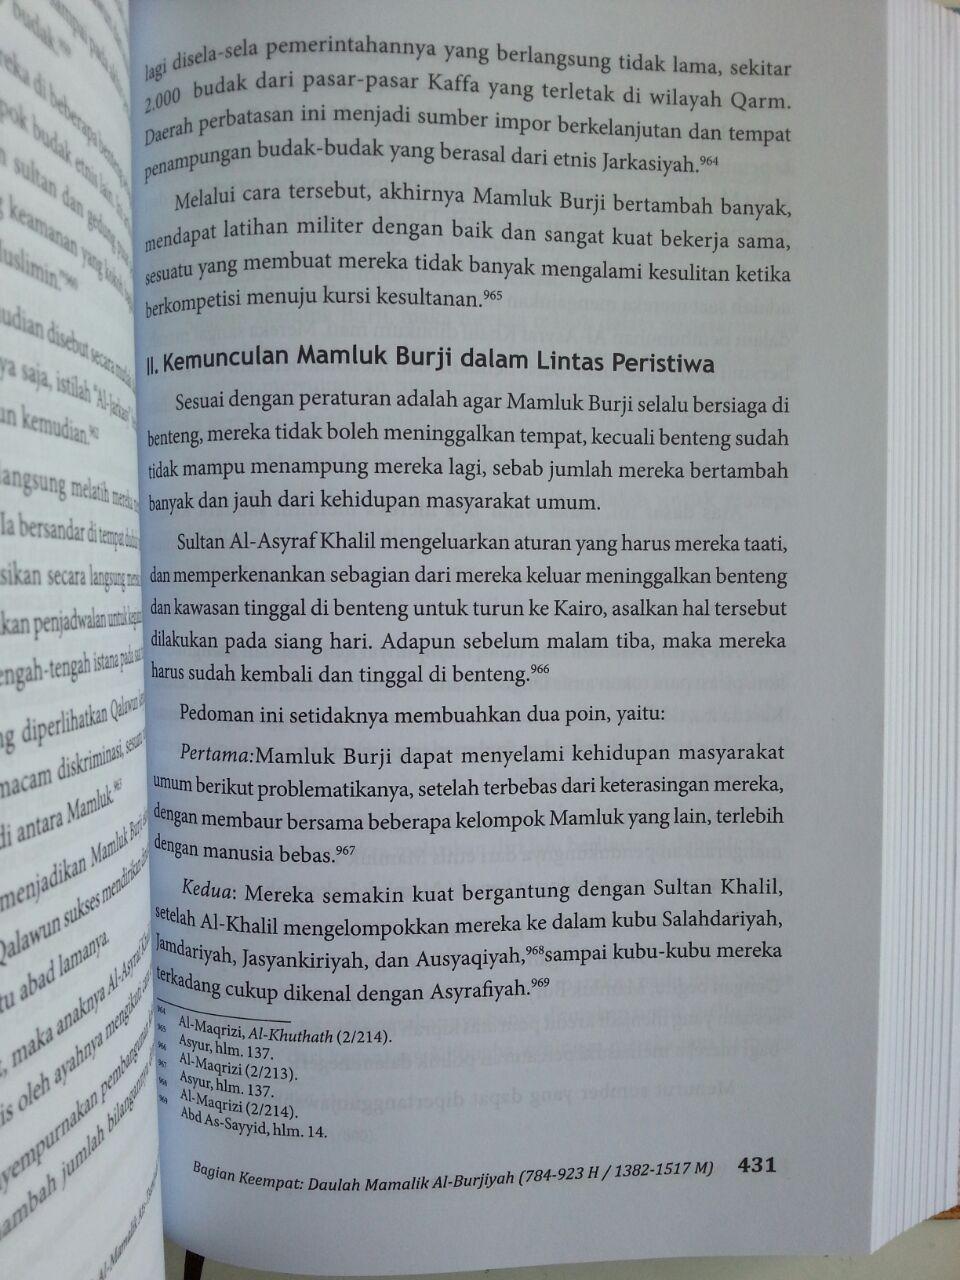 Buku Bangkit Dan Runtuhnya Dinasti Mamluk Di Mesir Dan Syam isi 3